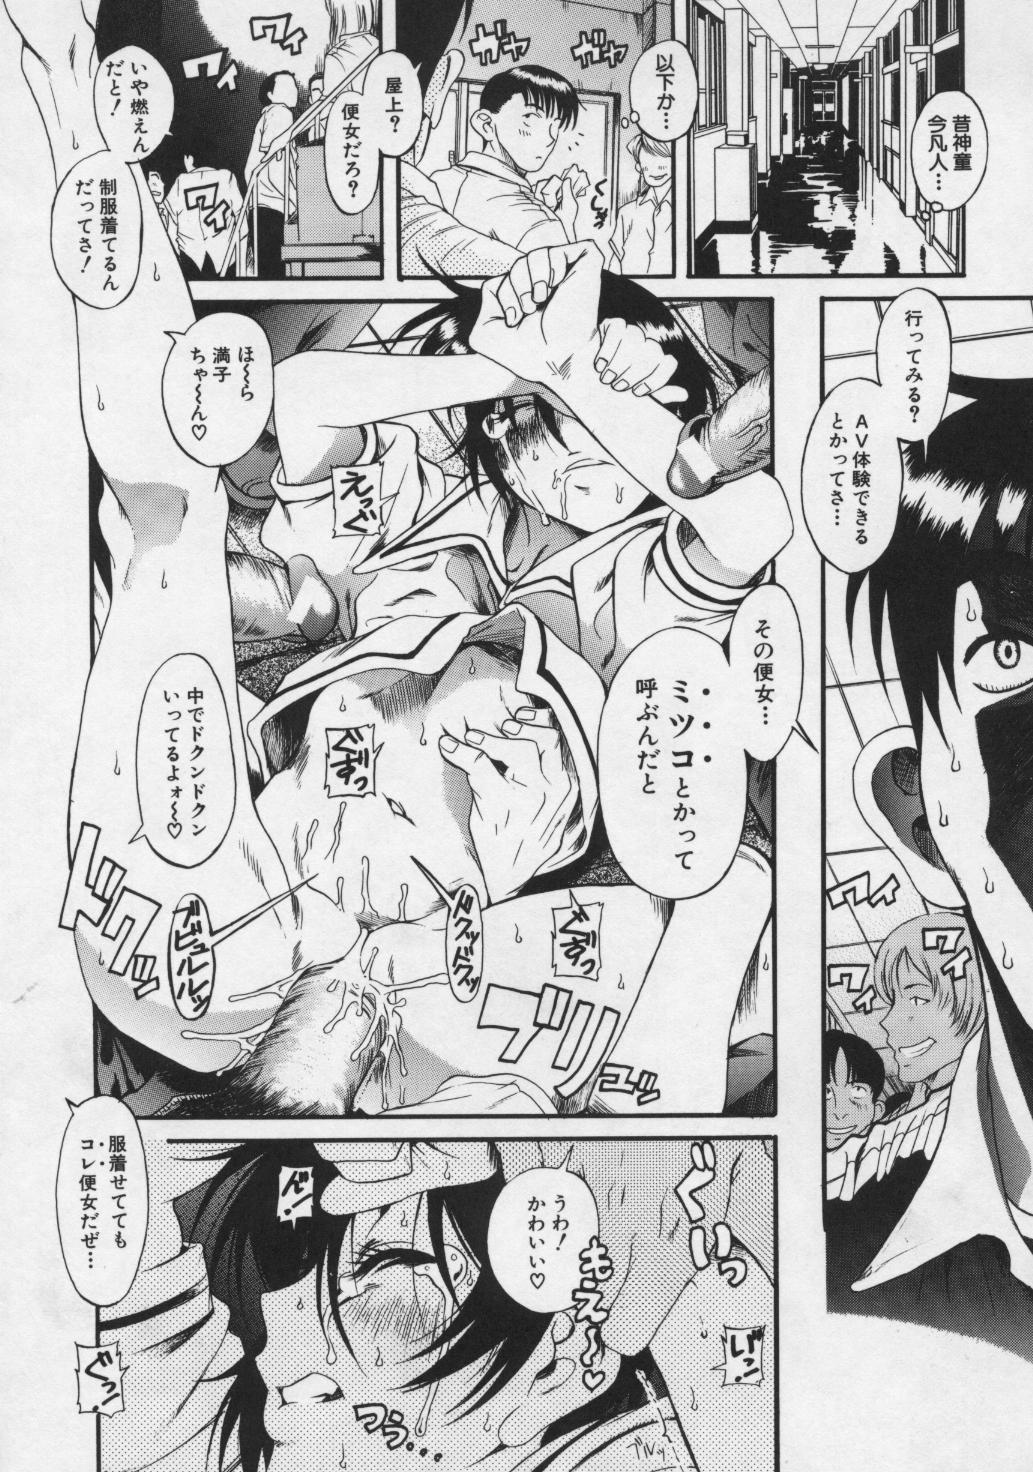 Kimi no Na o Yobeba - If I call your name. 73